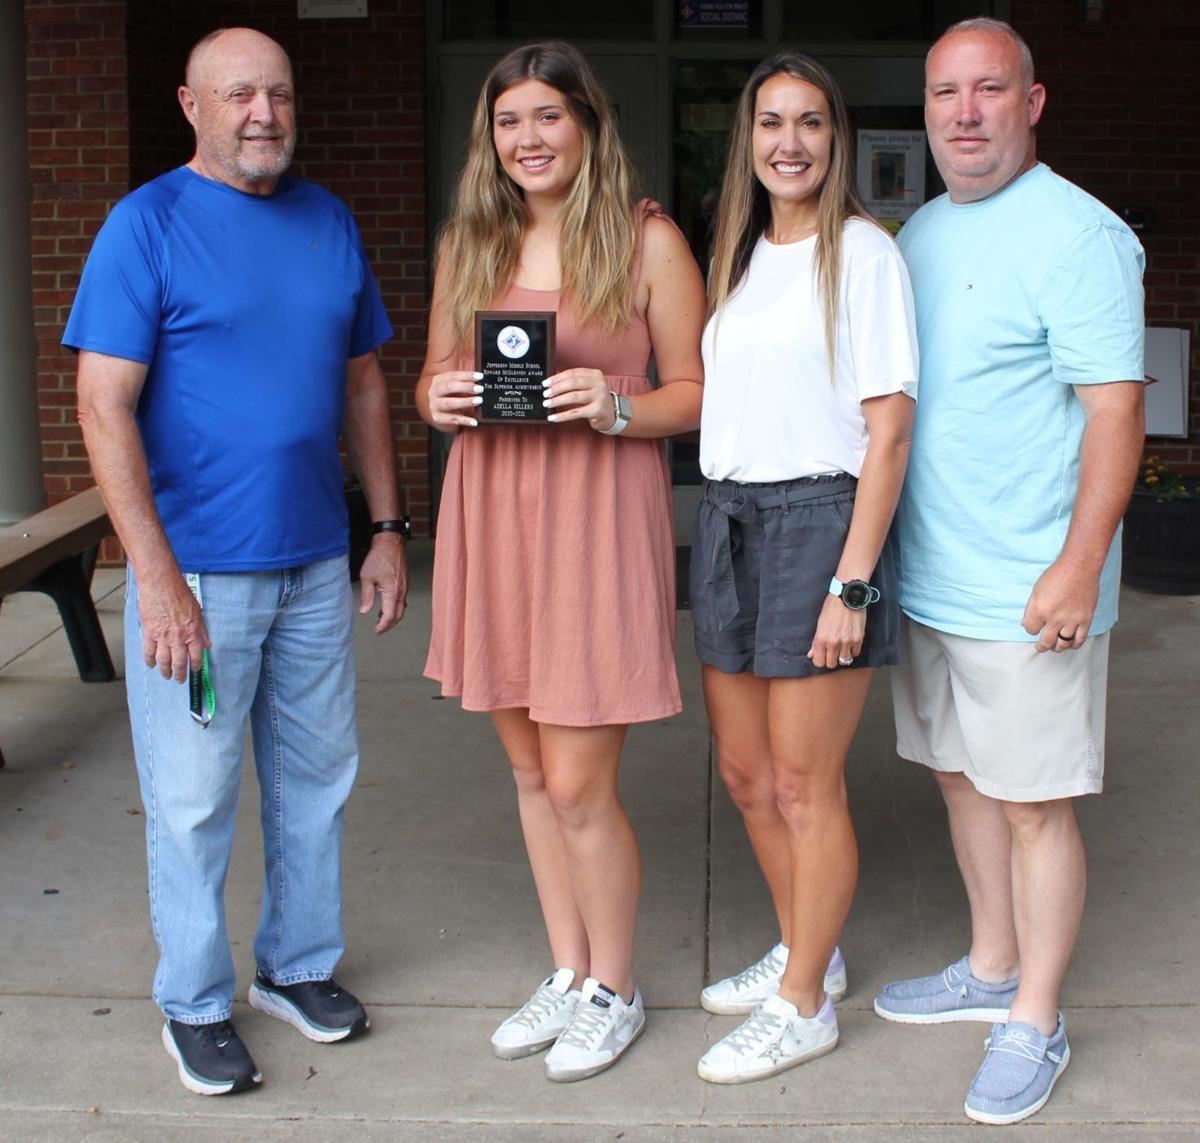 Benson and Sellers win McGlennen Award